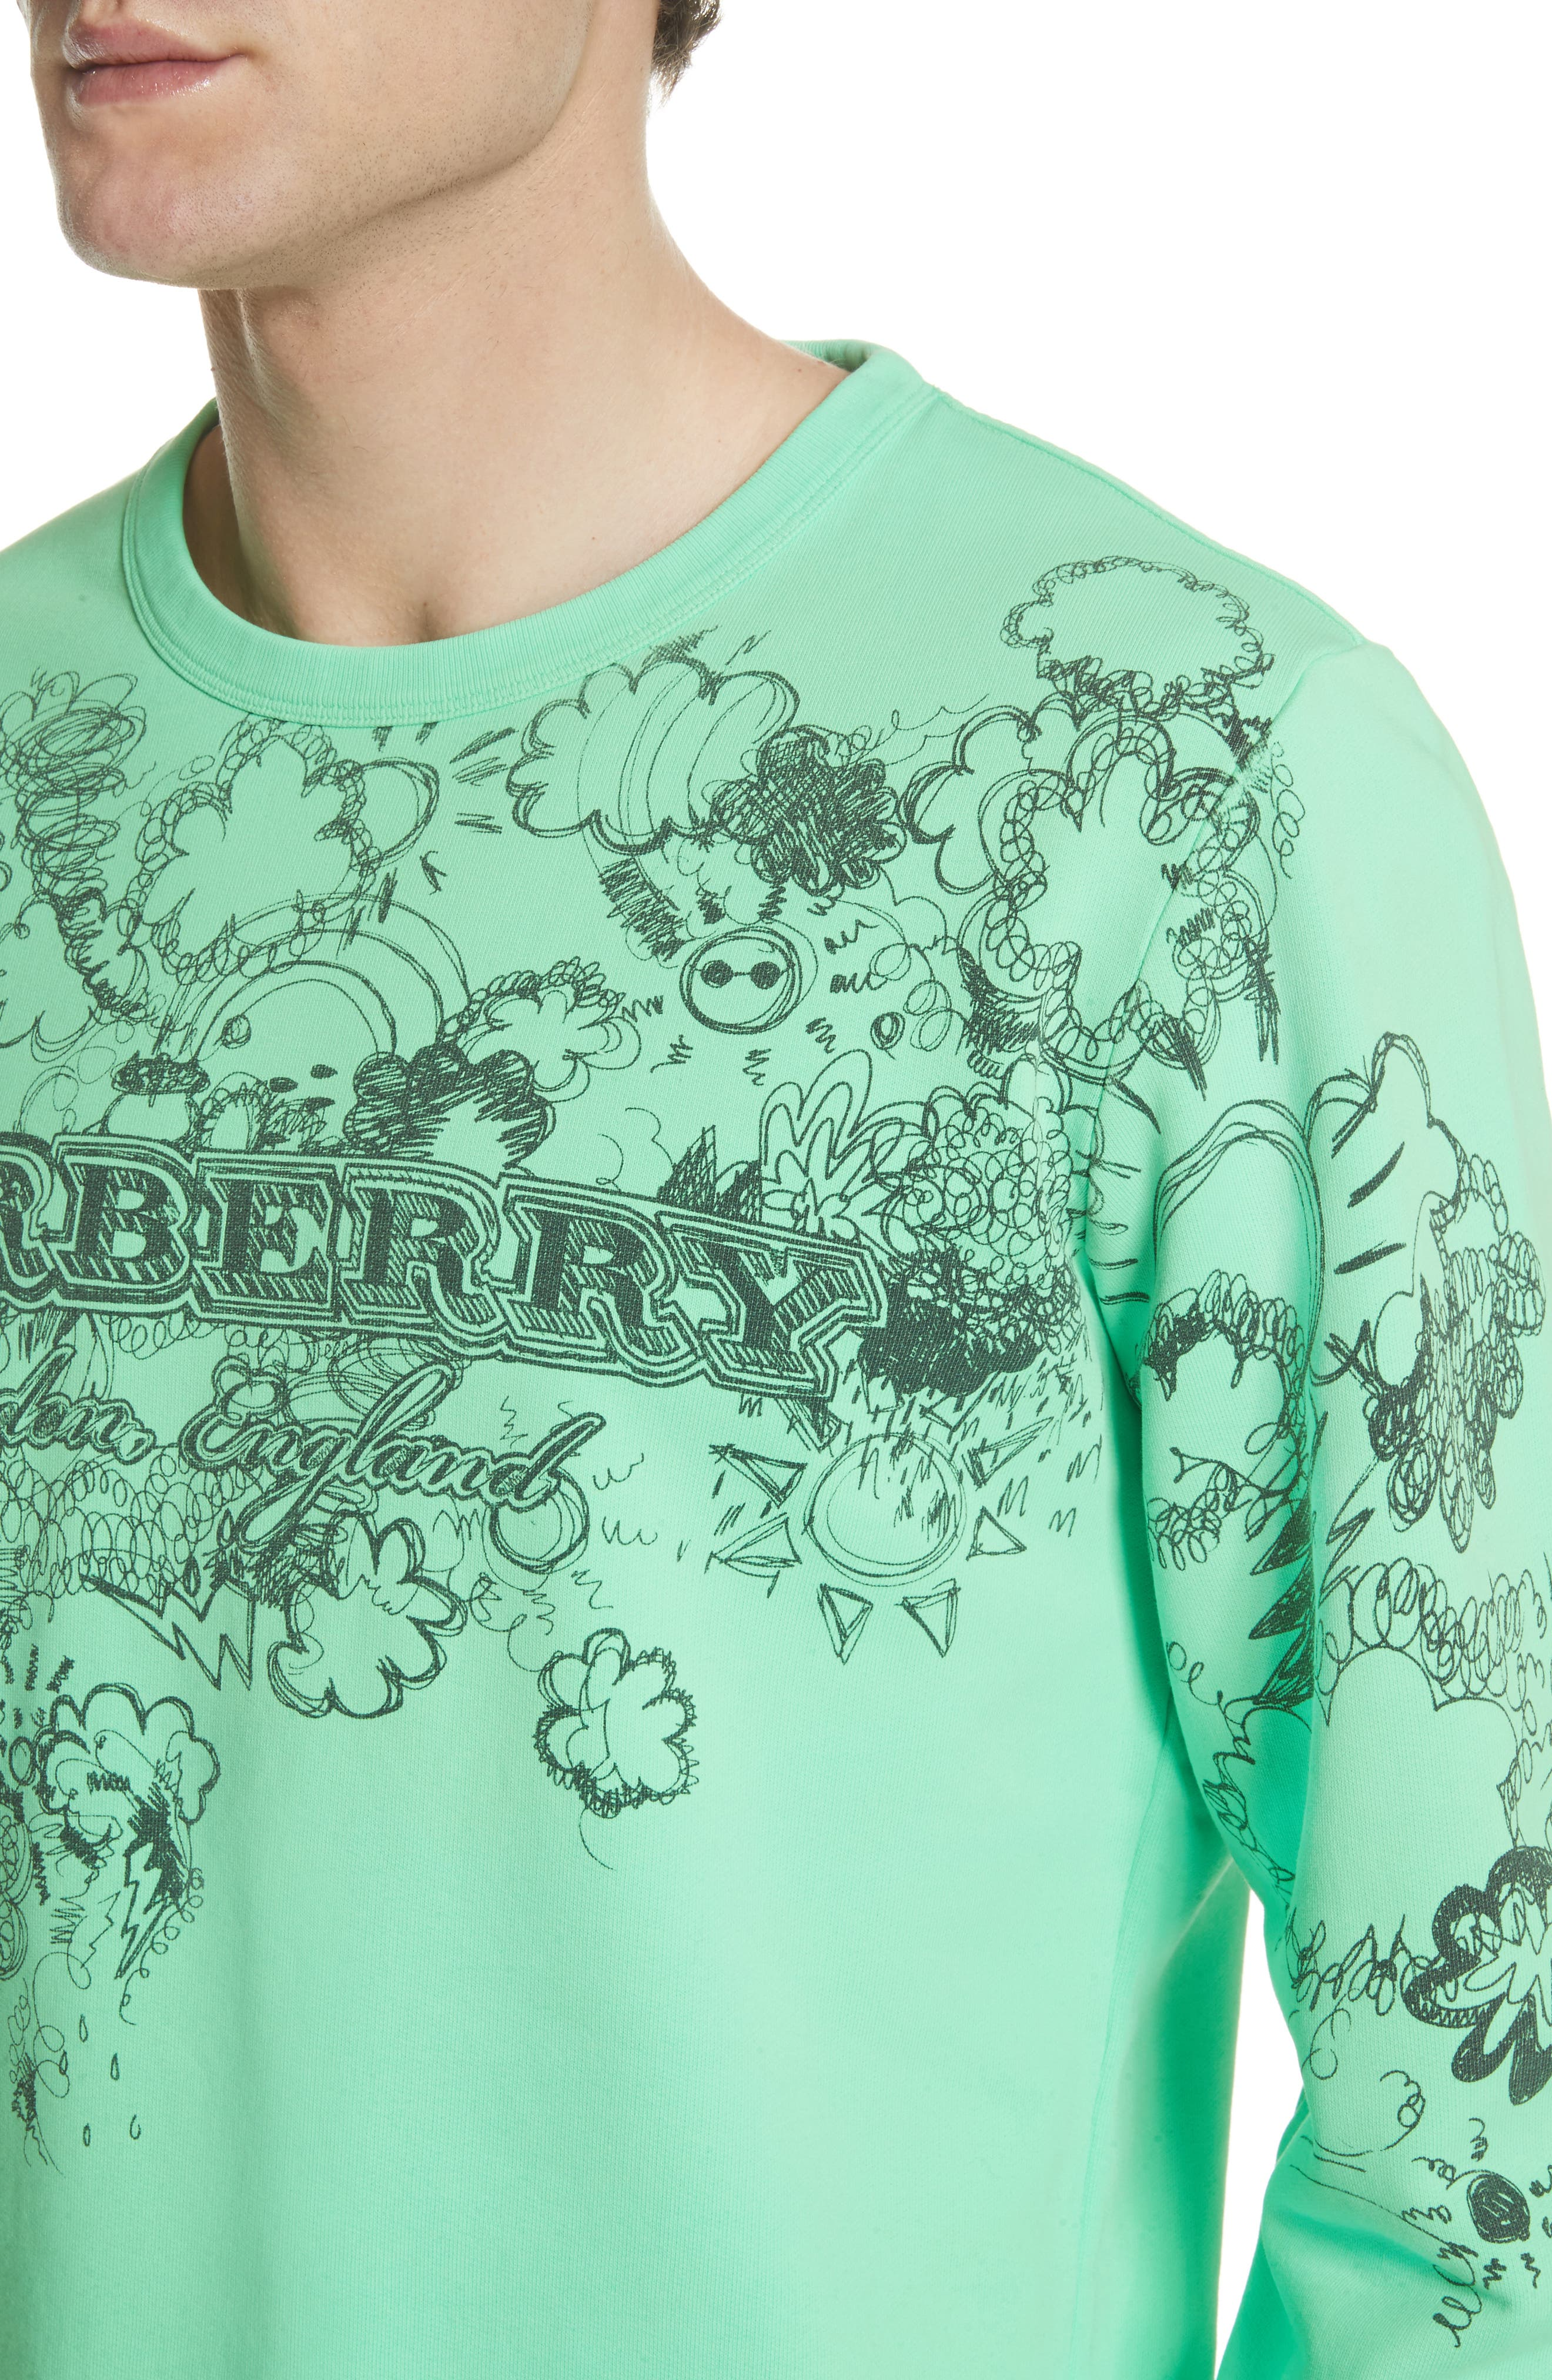 Madon Graphic Sweatshirt,                             Alternate thumbnail 4, color,                             300